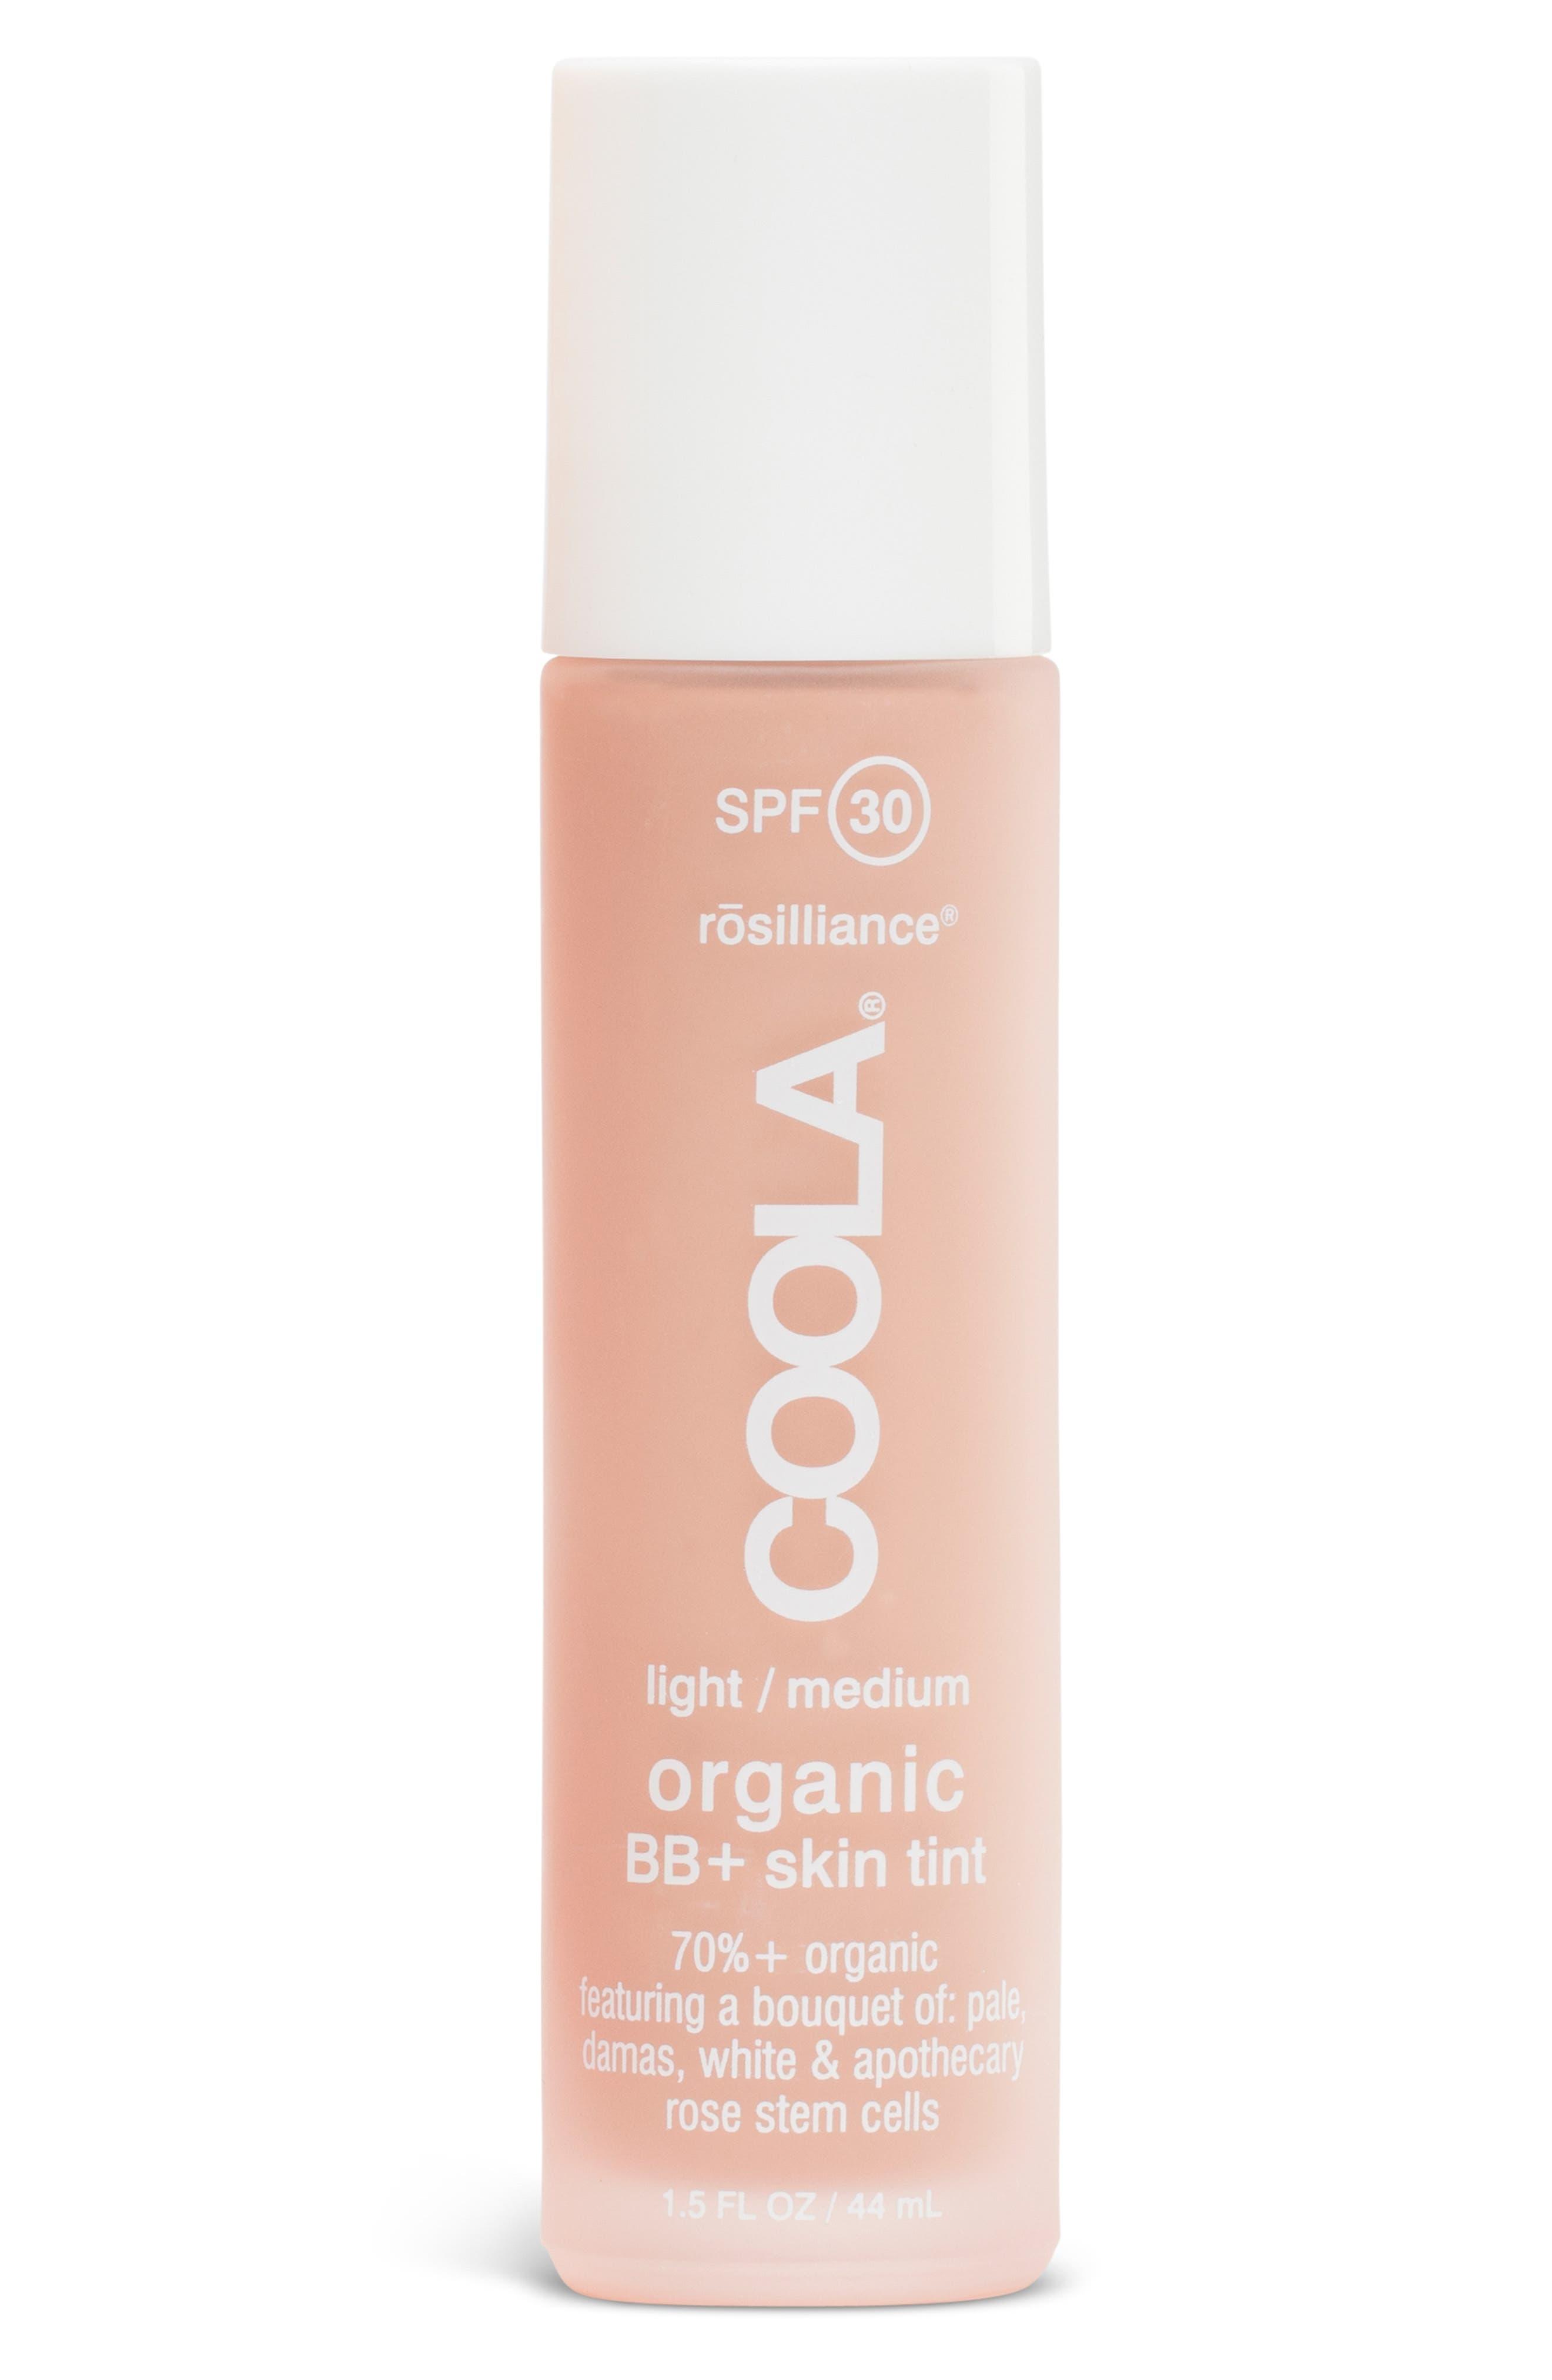 Coola Suncare Rosilliance(TM) Mineral Bb+ Cream Tinted Organic Sunscreen Spf 30